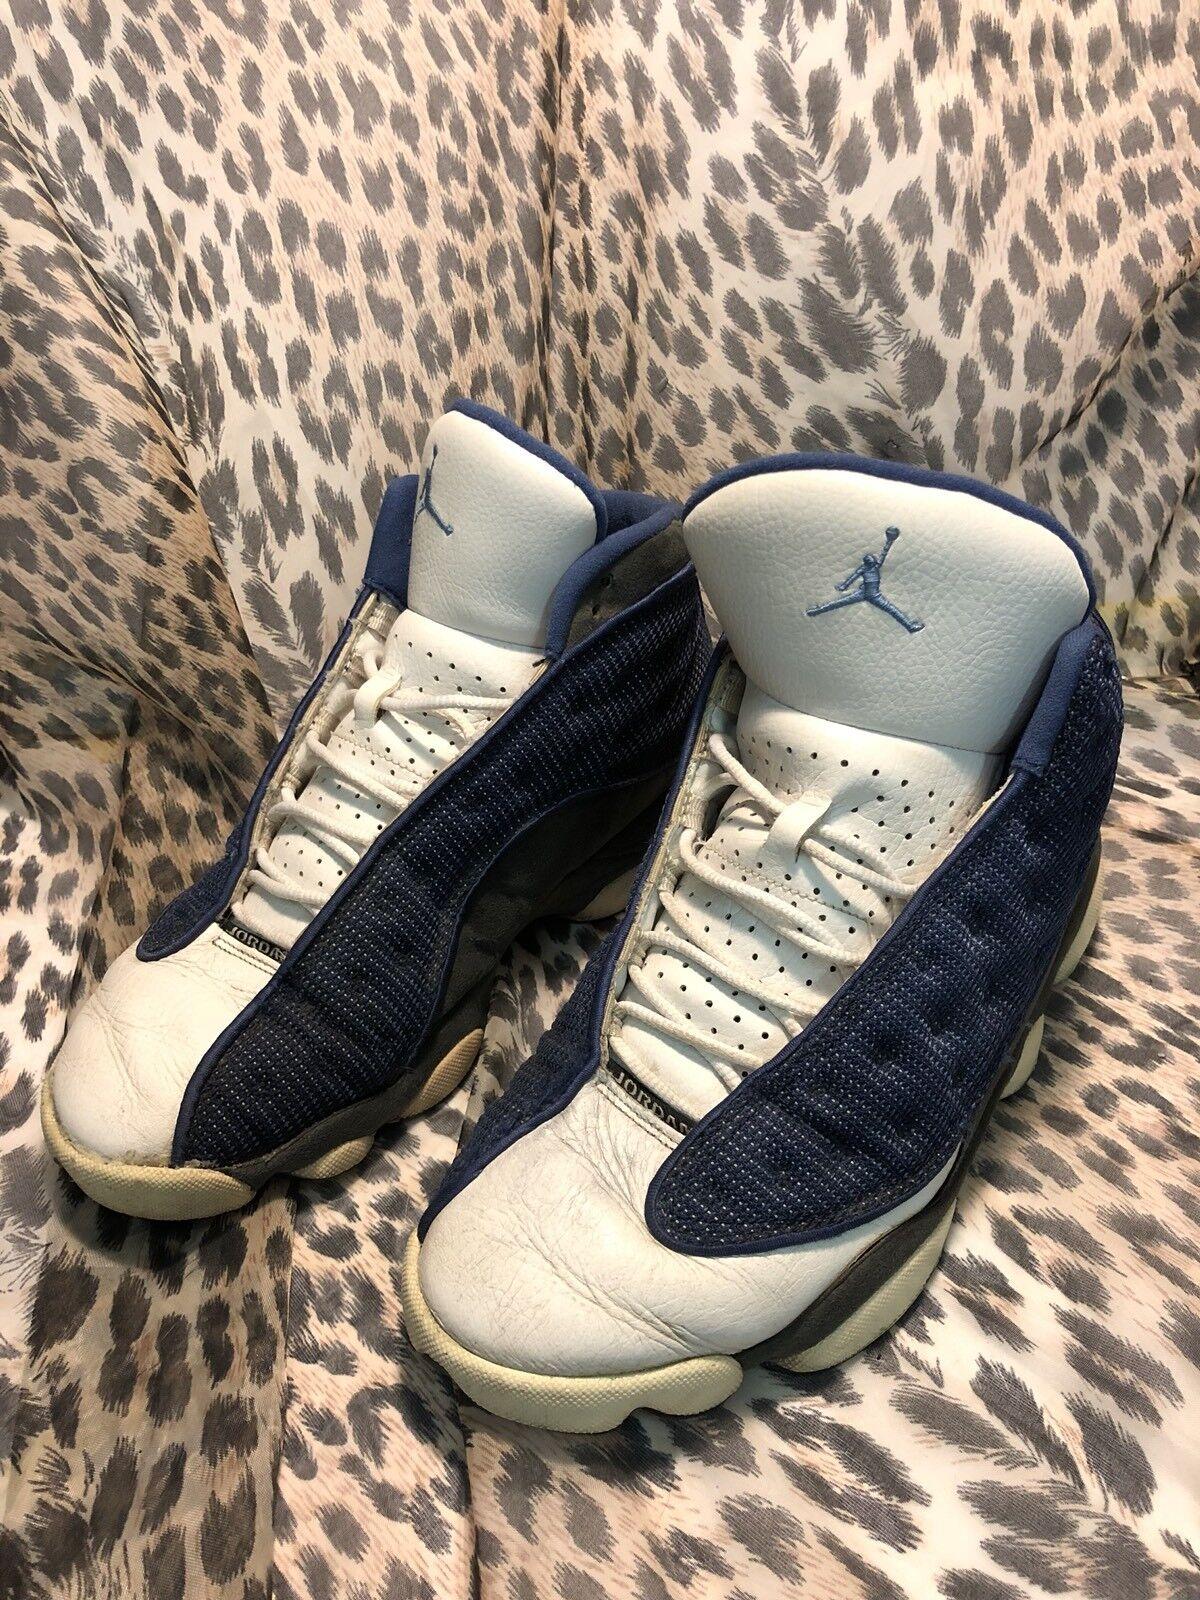 Nike Air Jordan 13 XIII Retro French Blue 310004-441 Sz 8 2004